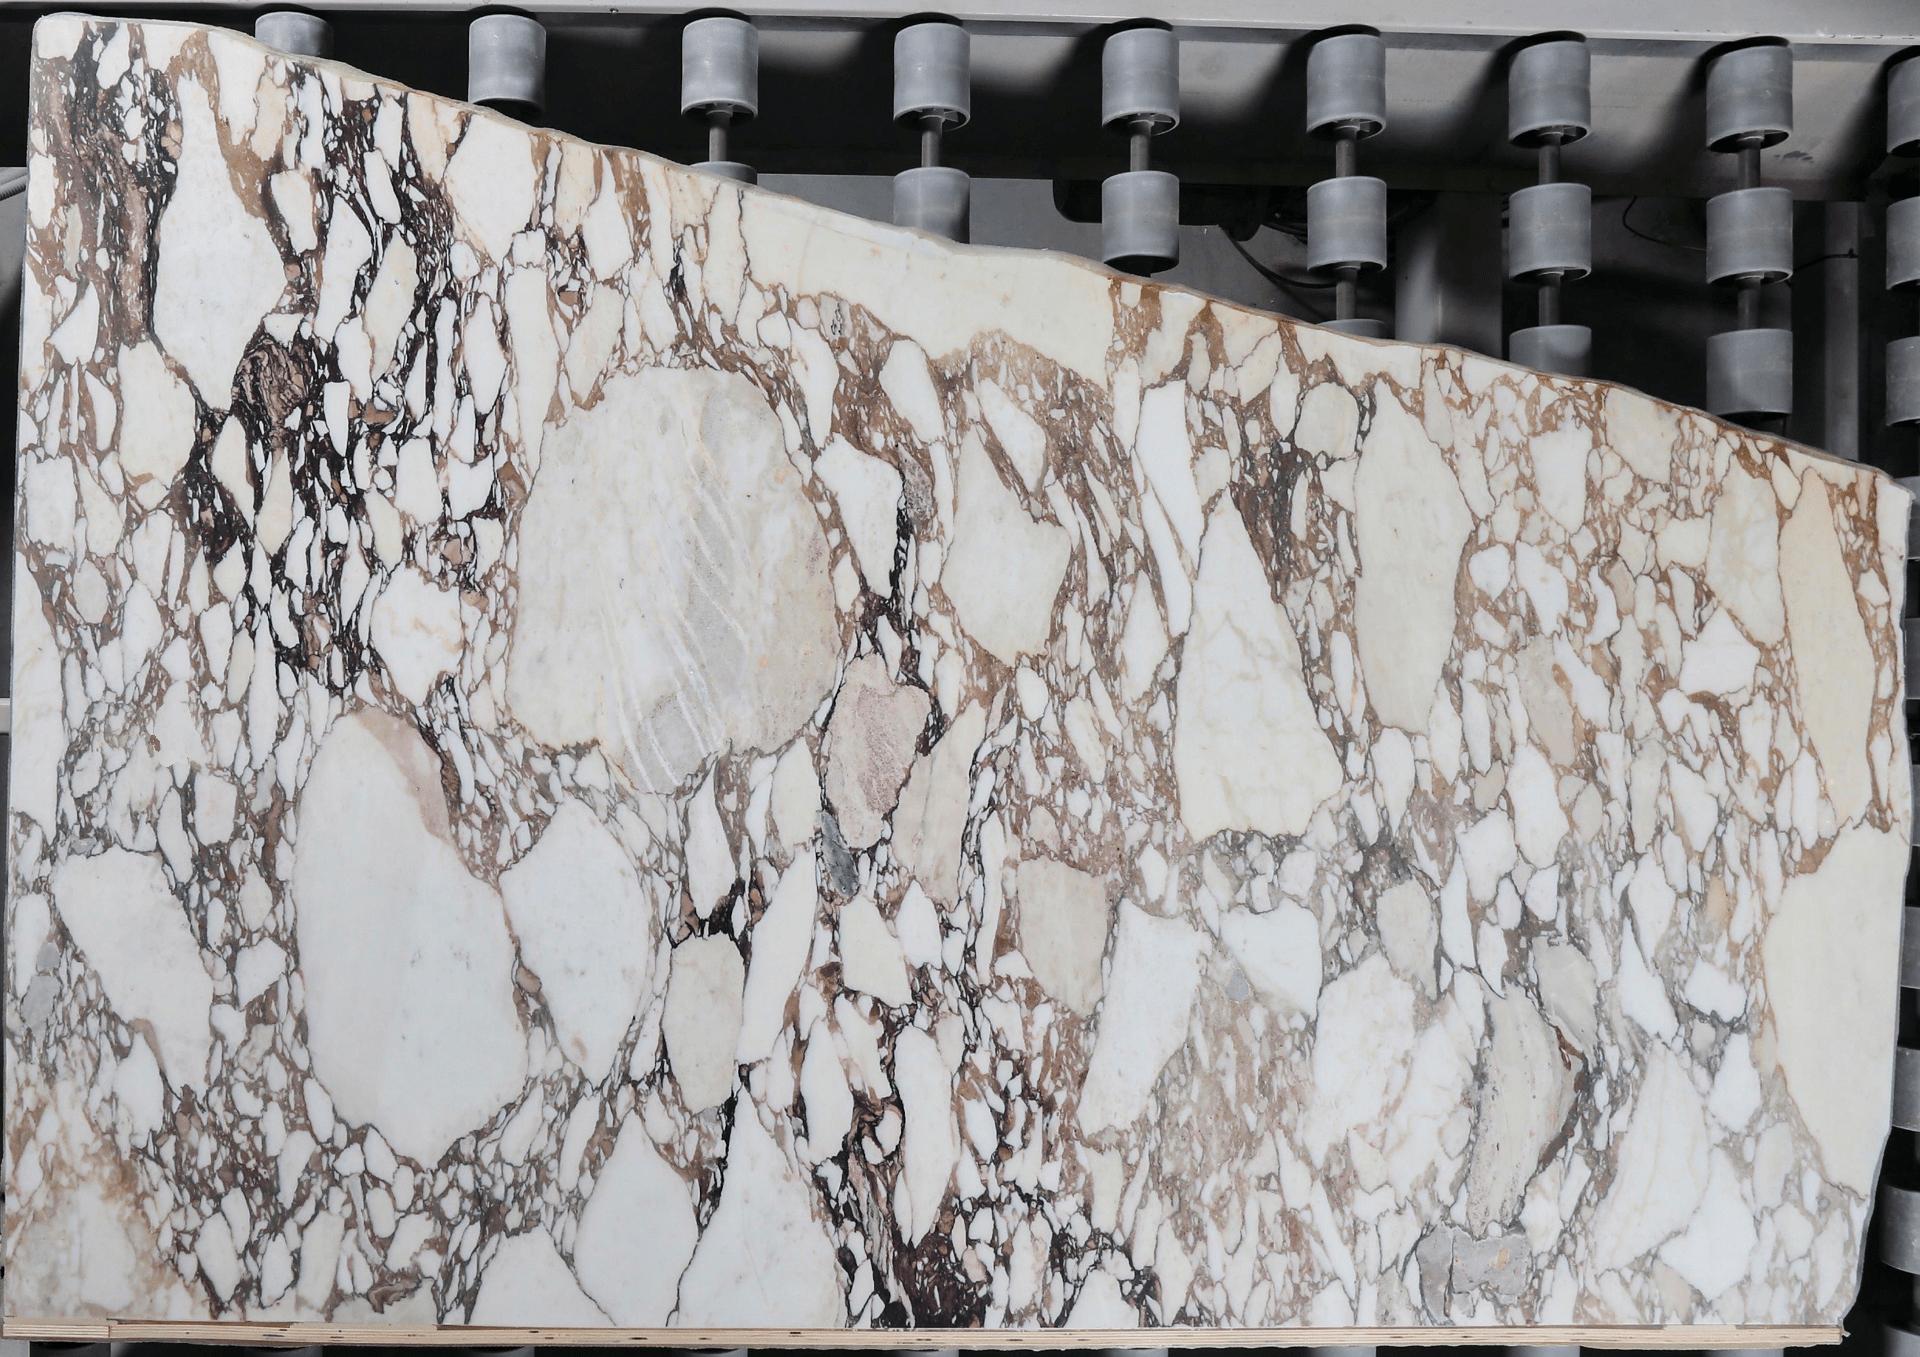 Carrara Calacatta Vagli Oro 06